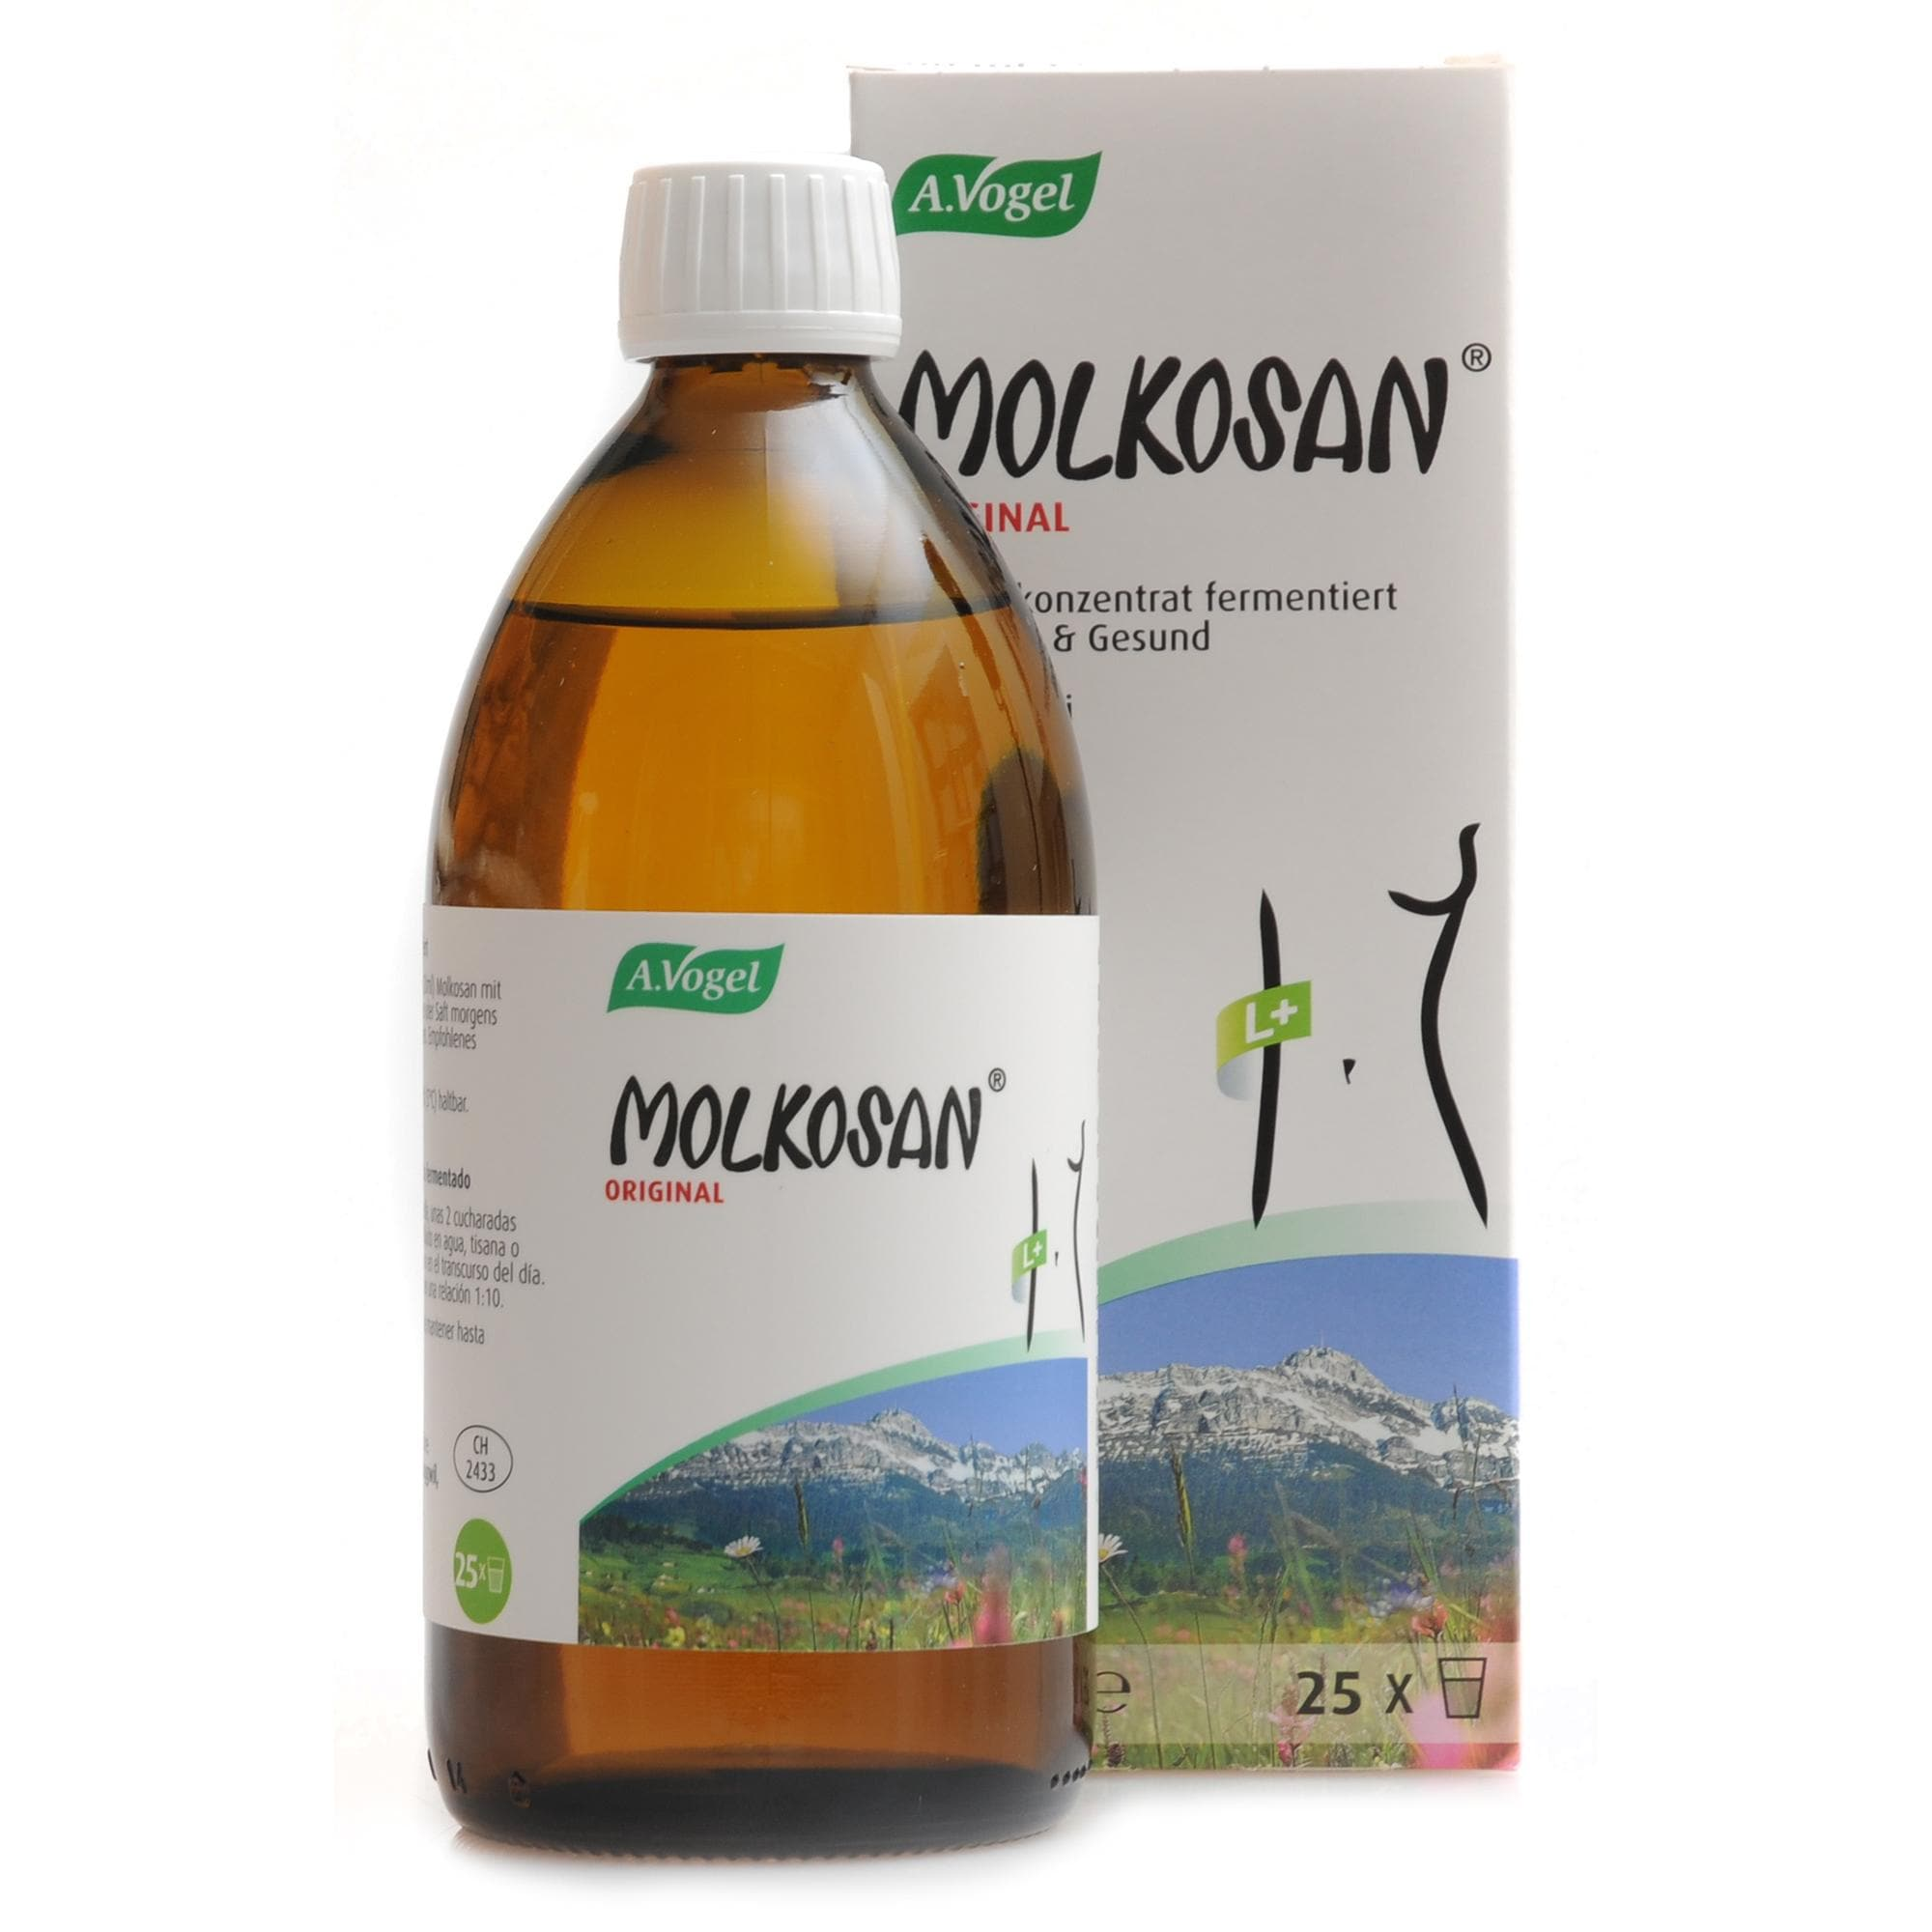 A.Vogel Molkosan Molkenkonzentrat fermentiert (konv. Anbau) 500ml